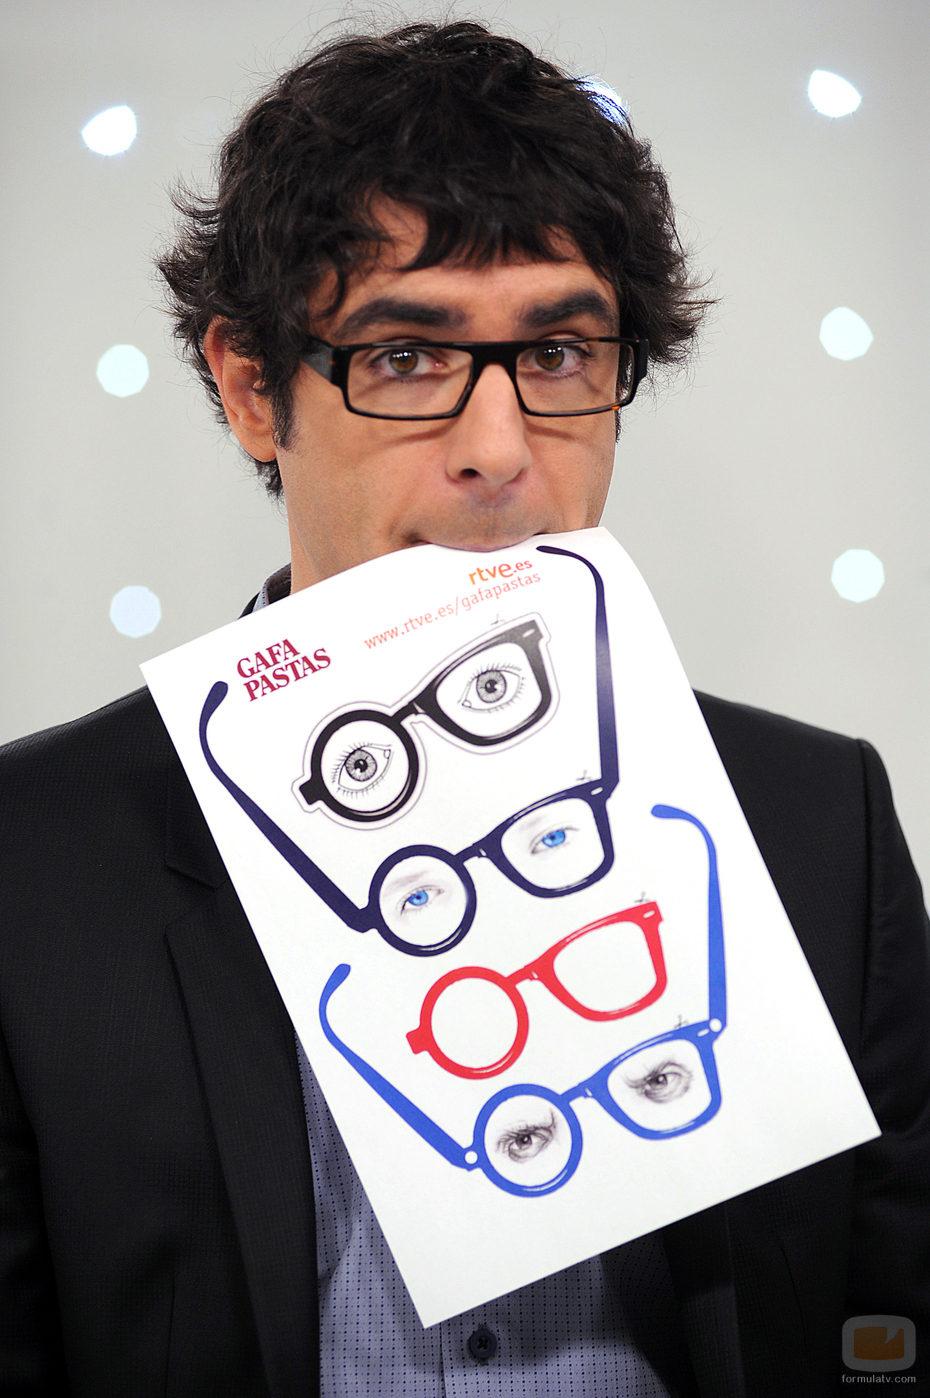 El presentador, Juanra Bonet, luce sus gafapastas